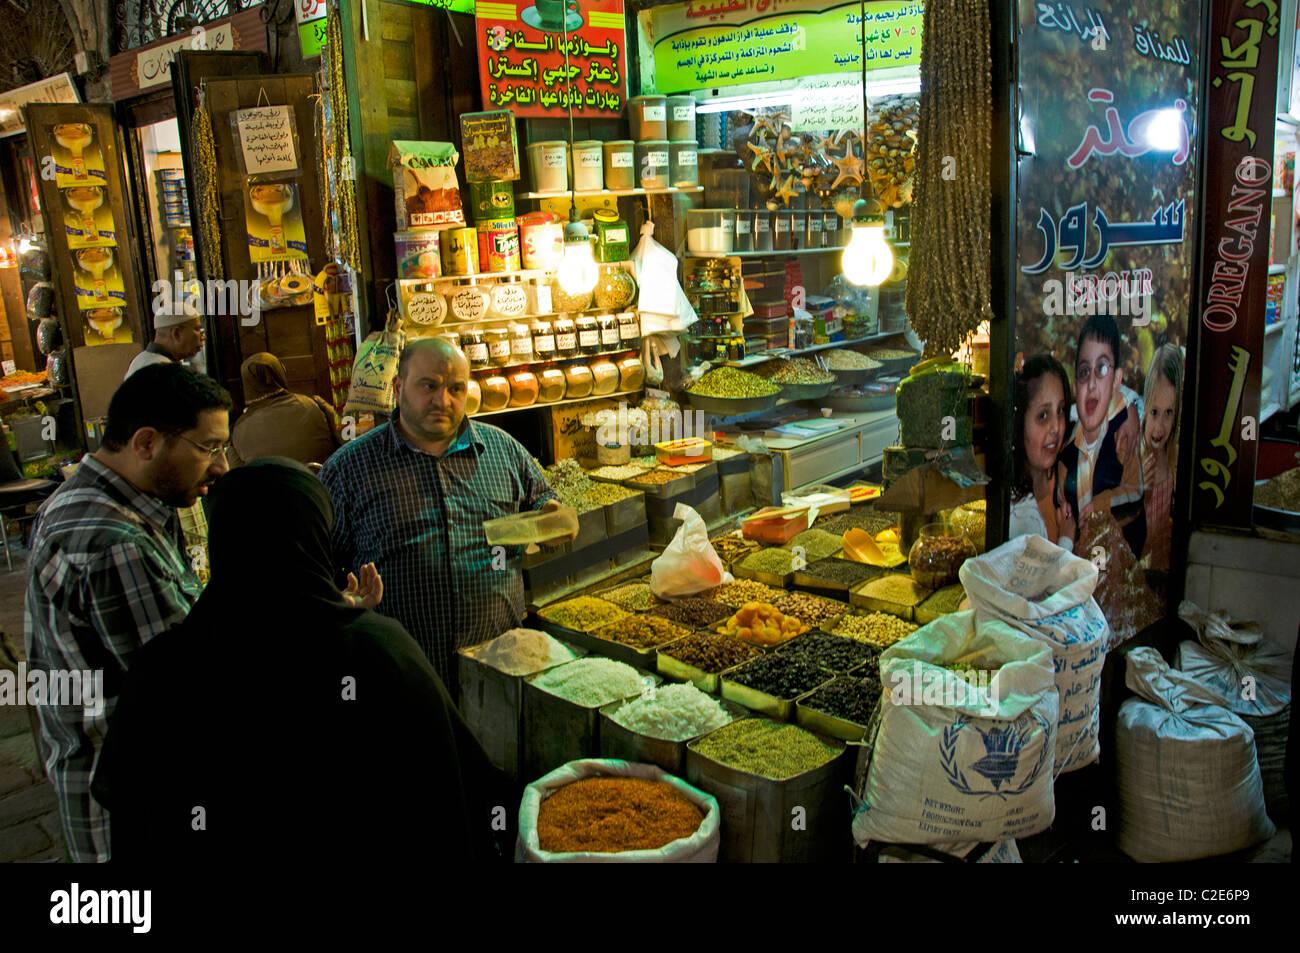 Damaskus-Syrien-Basar-Souk Markt Lebensmittelhändler Lebensmittelgeschäft Stockbild